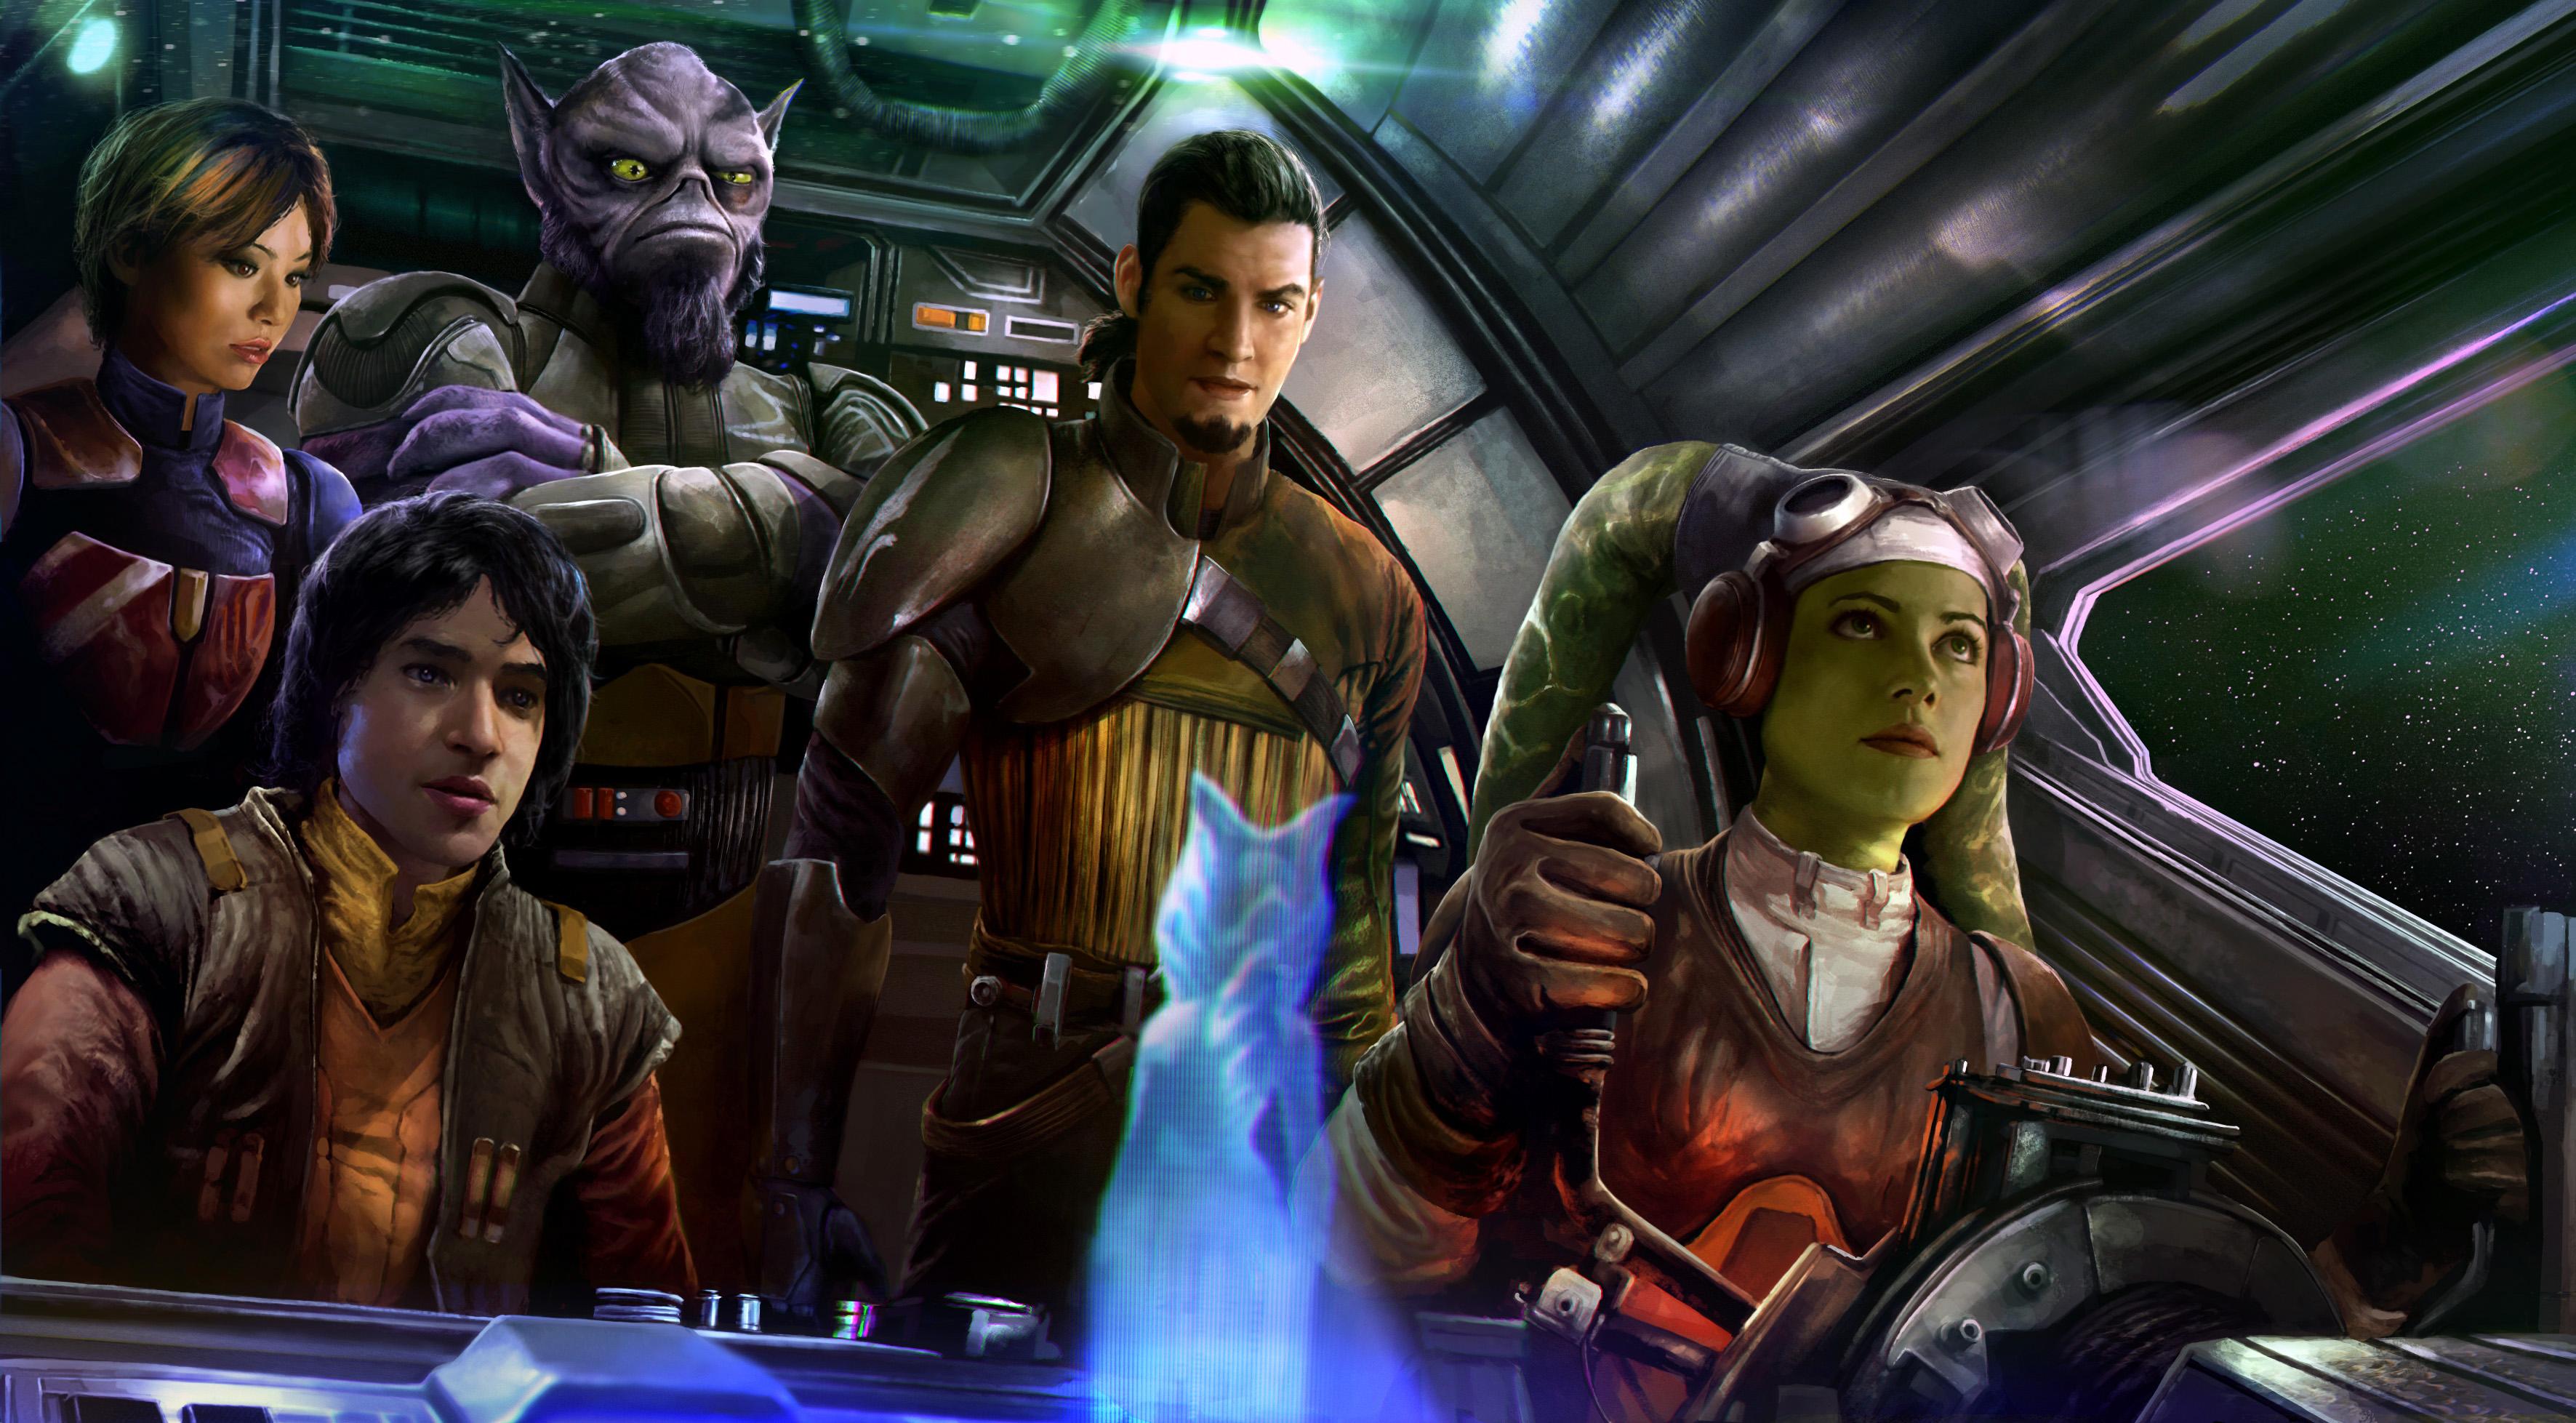 star wars rebels by mehdic on deviantart